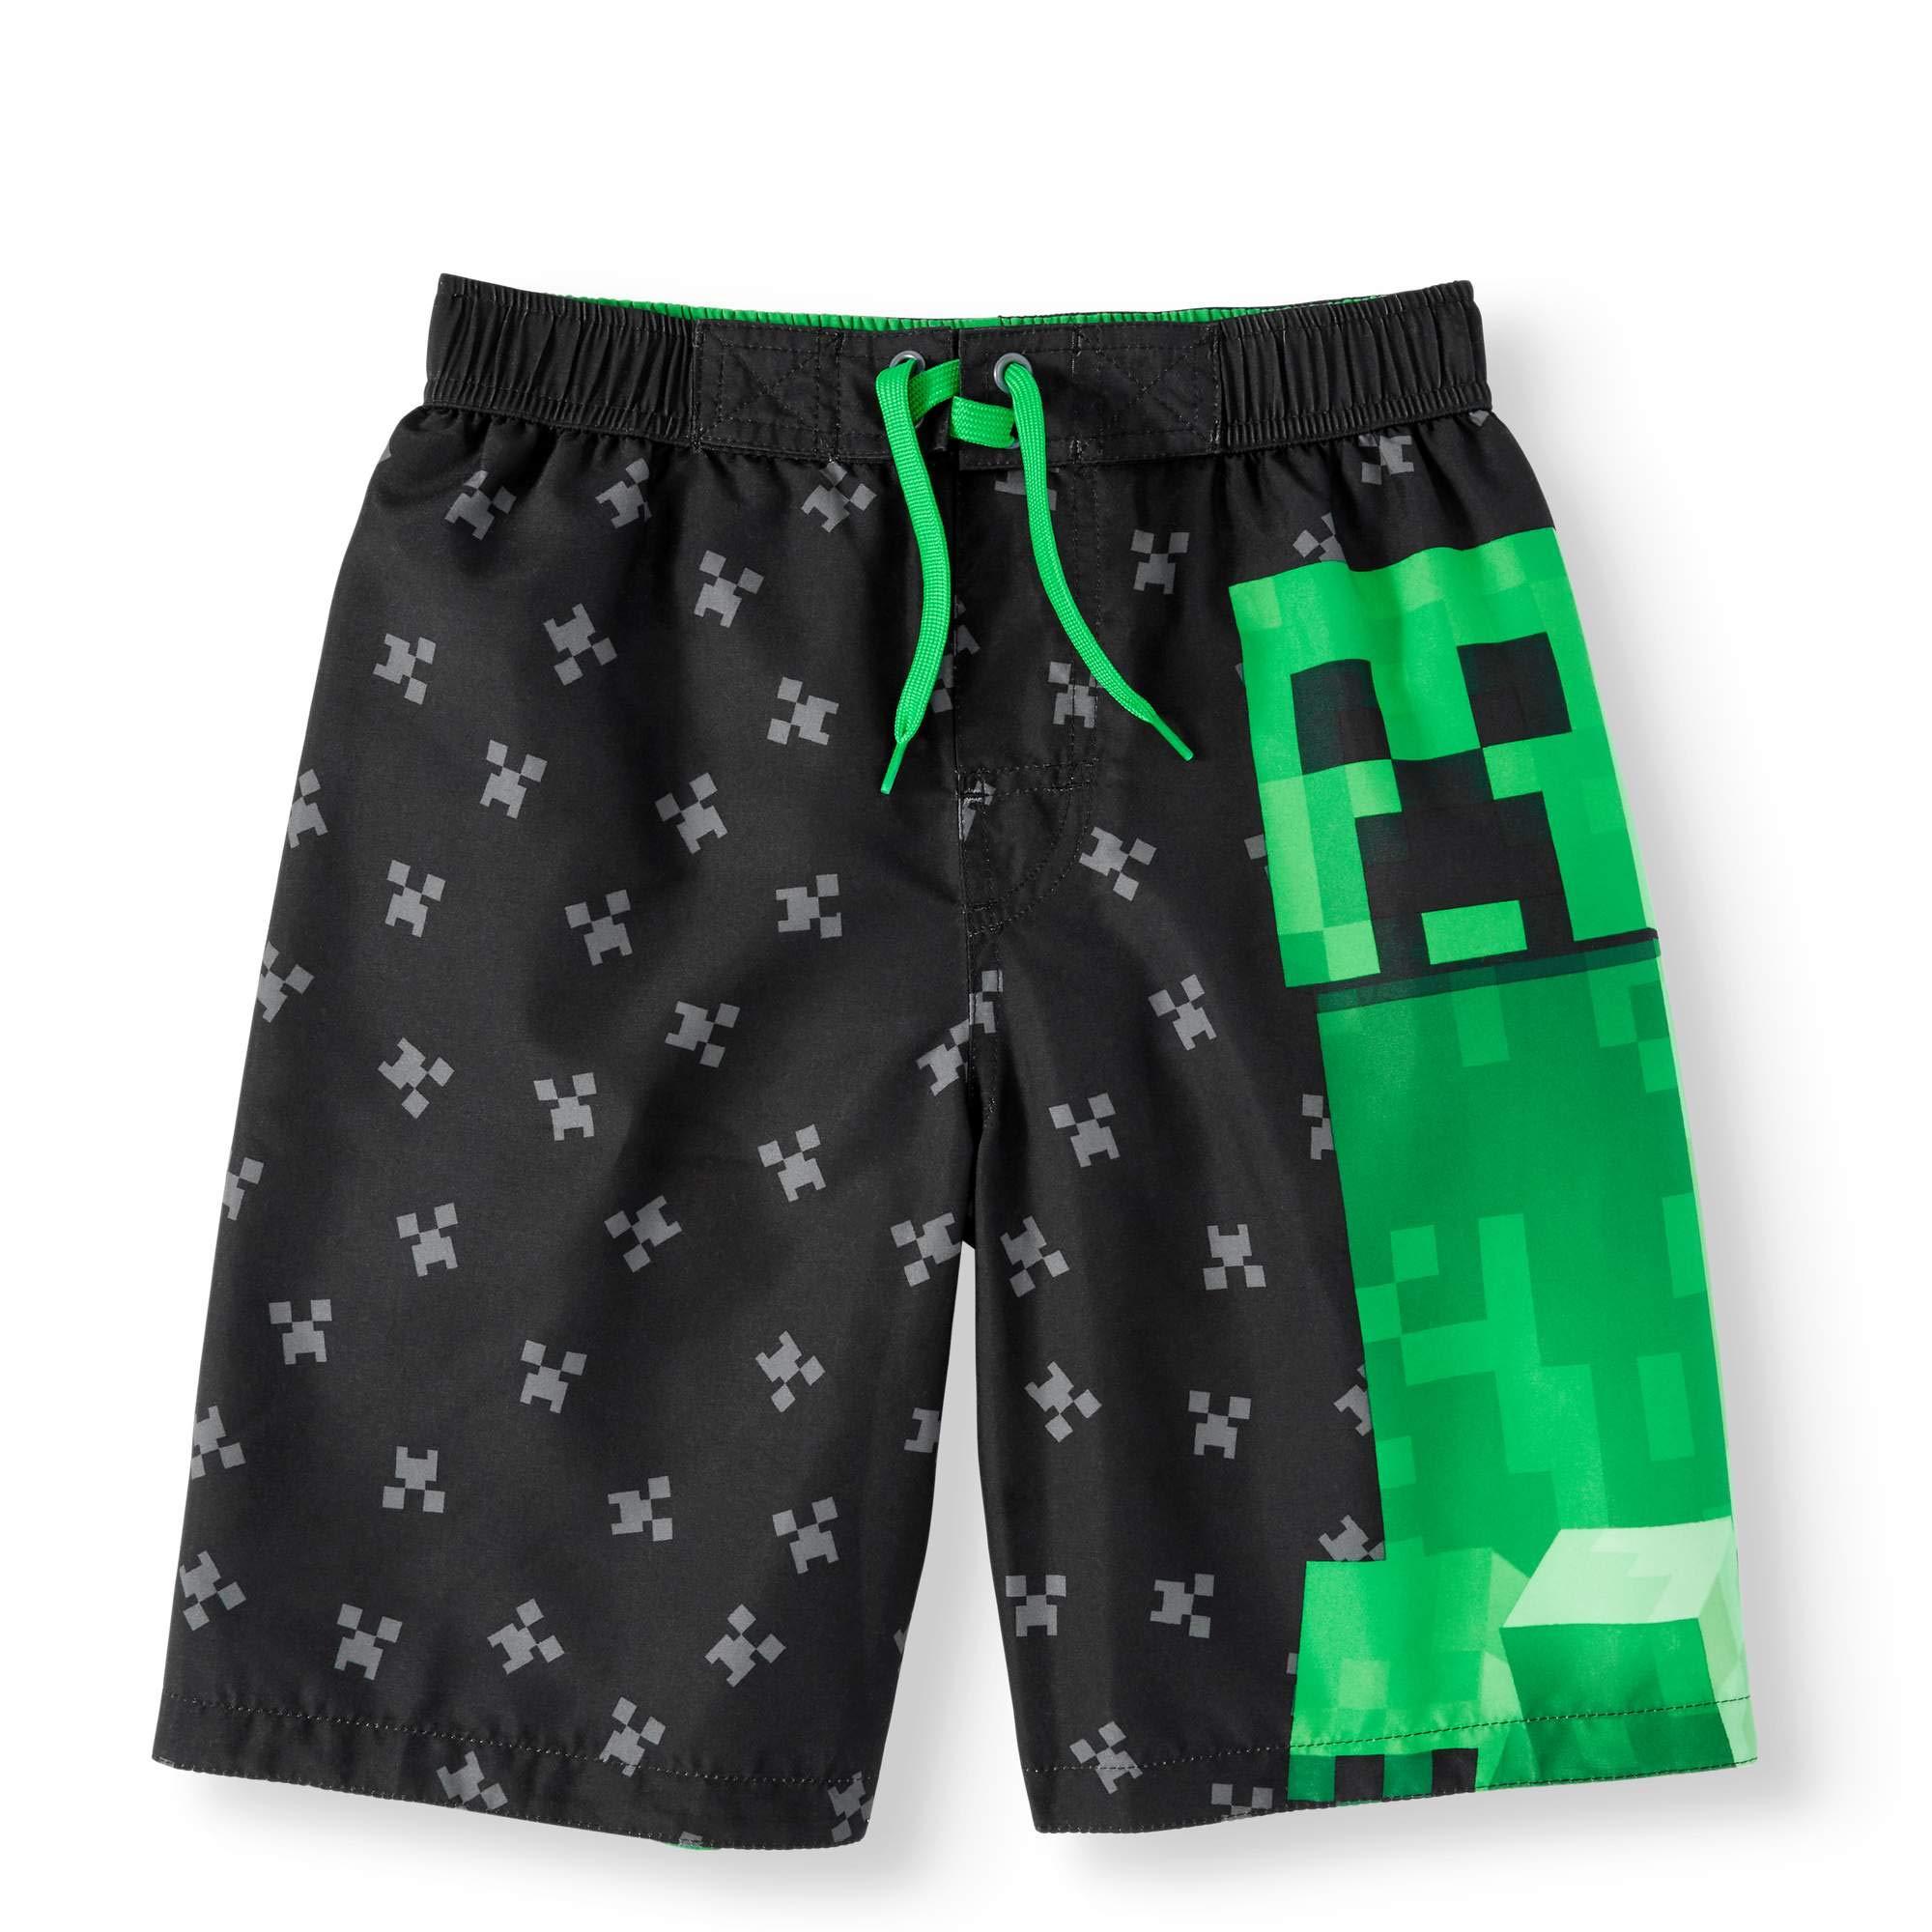 654469123c Amazon.com: Jynx Boy's Minecraft Swim Boardshort Trunks: Clothing